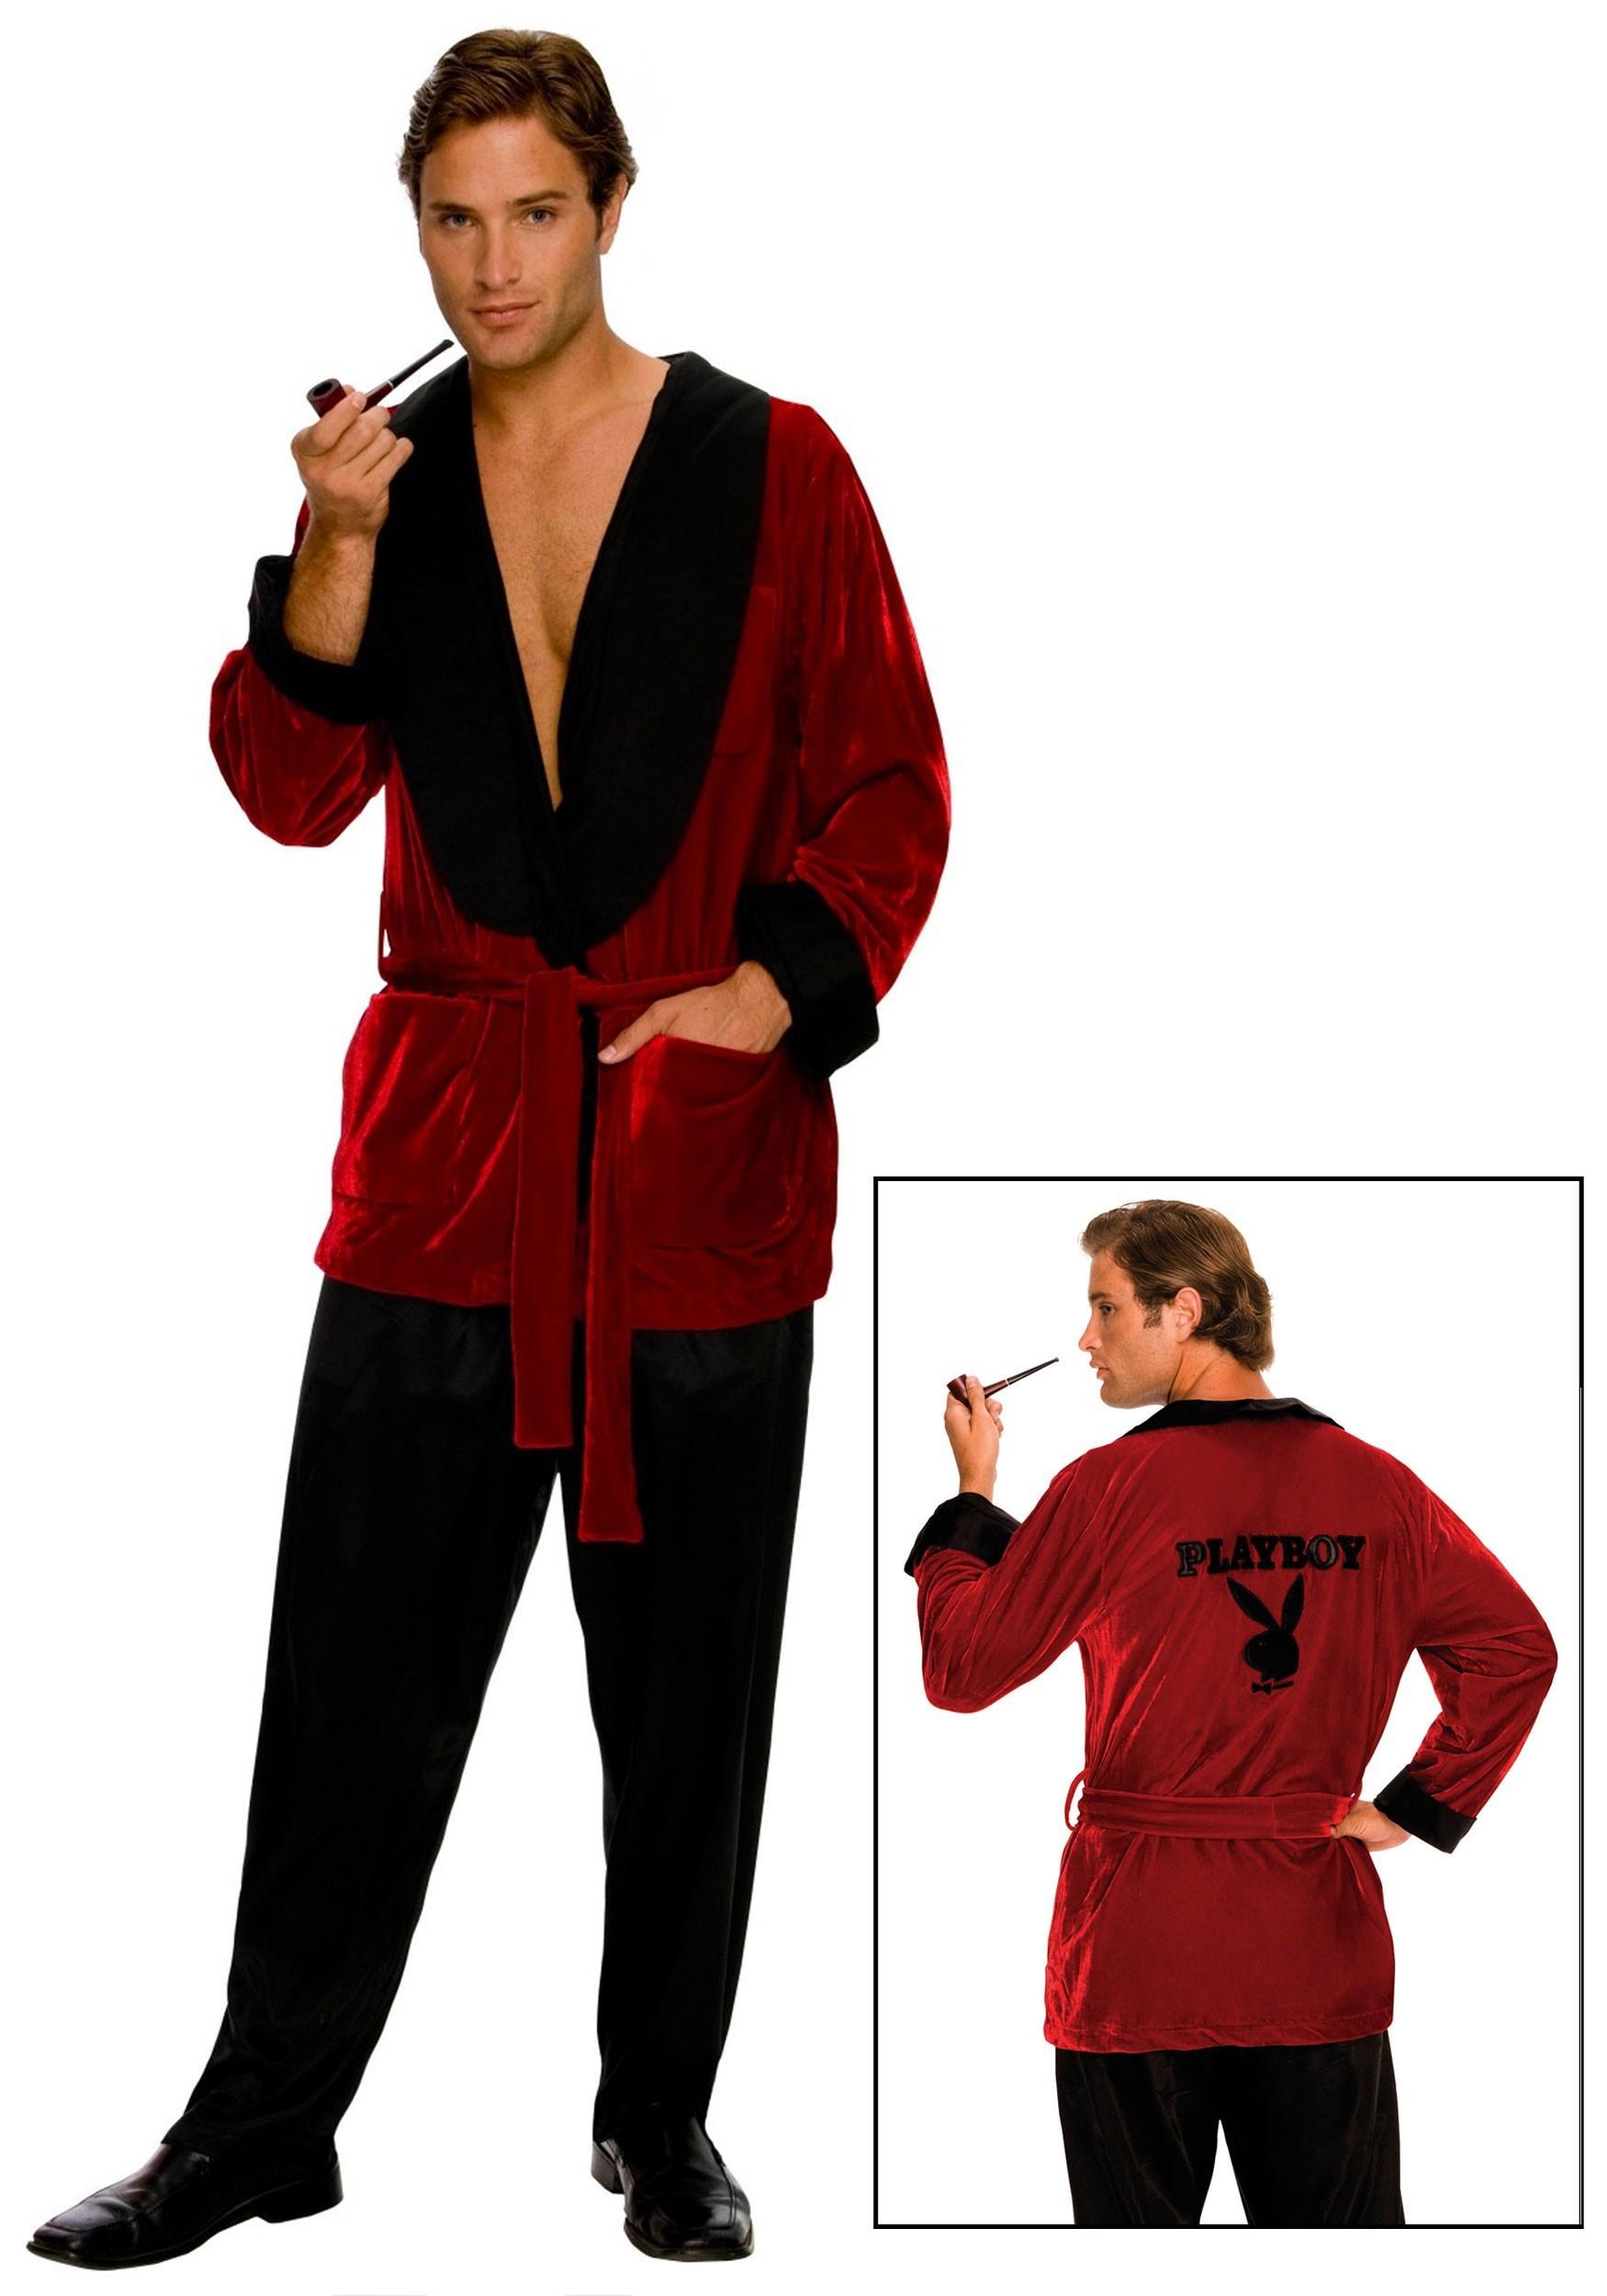 playboy hugh hefner smoking jacket - Halloween Costumes Playboy